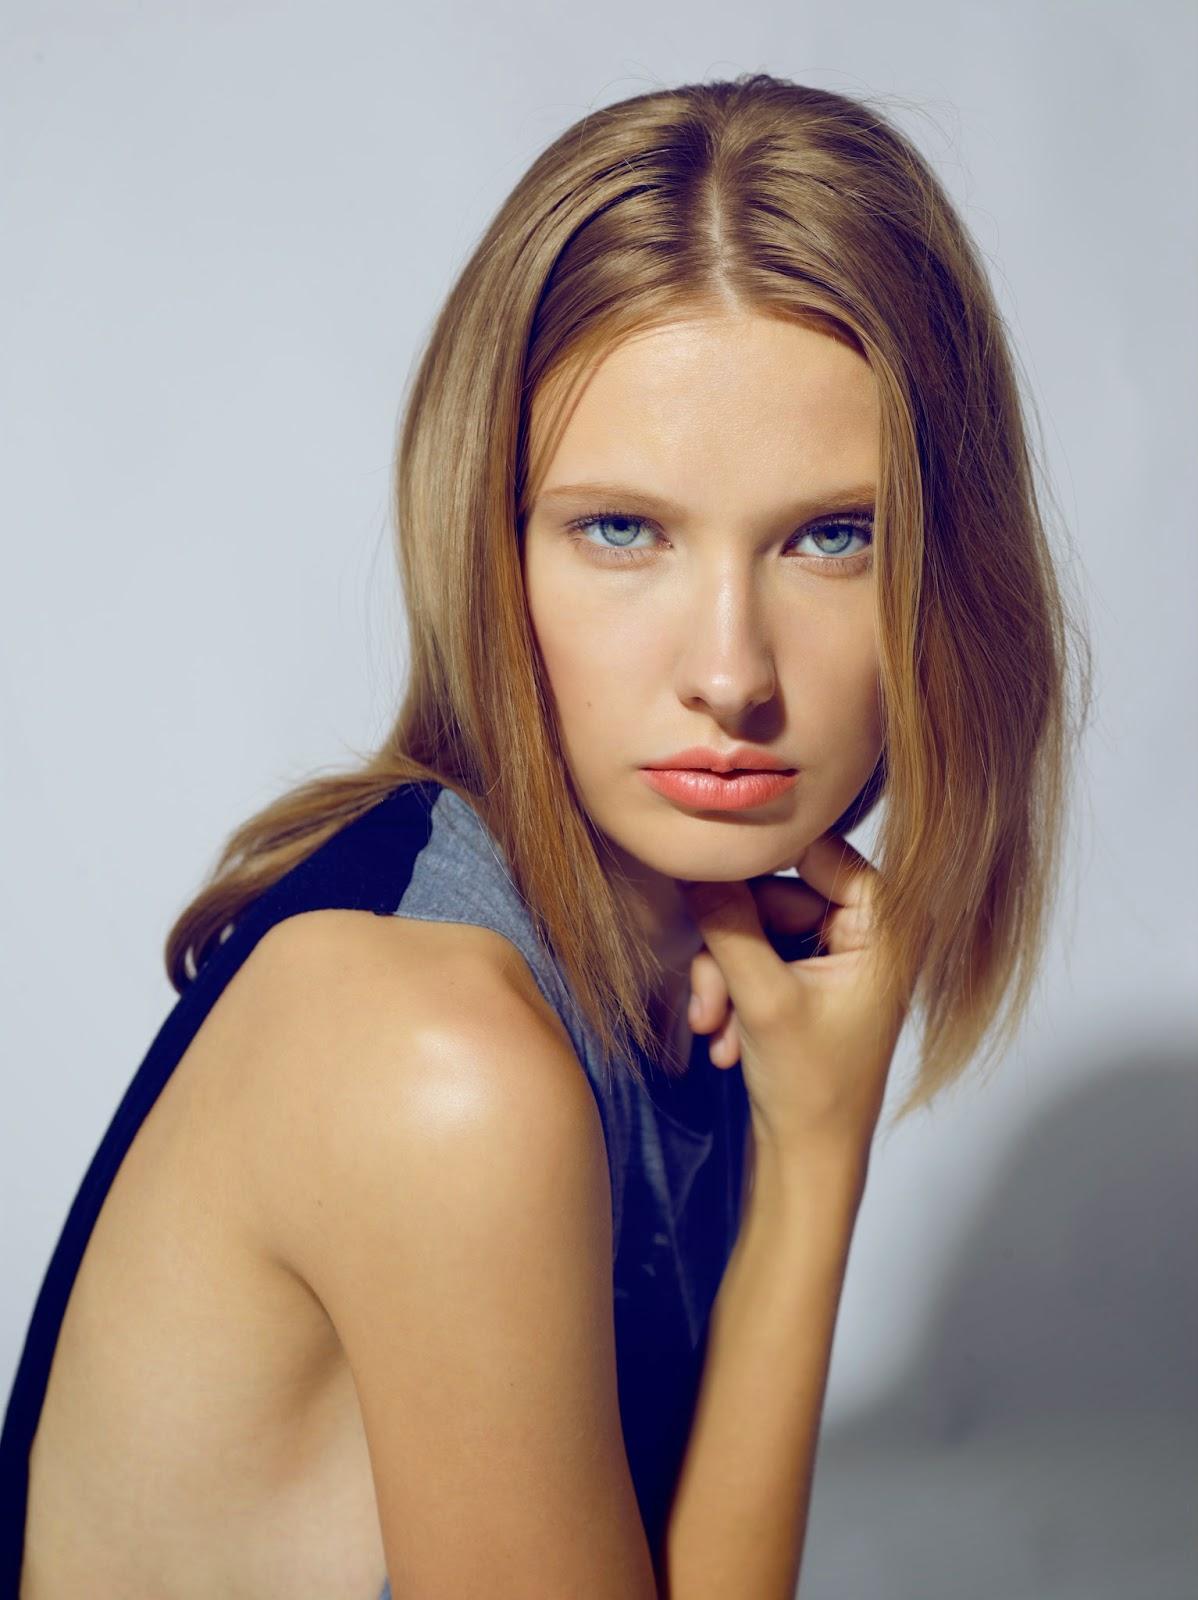 Paparazzi ICloud Olga Voronova  nudes (71 fotos), Twitter, bra